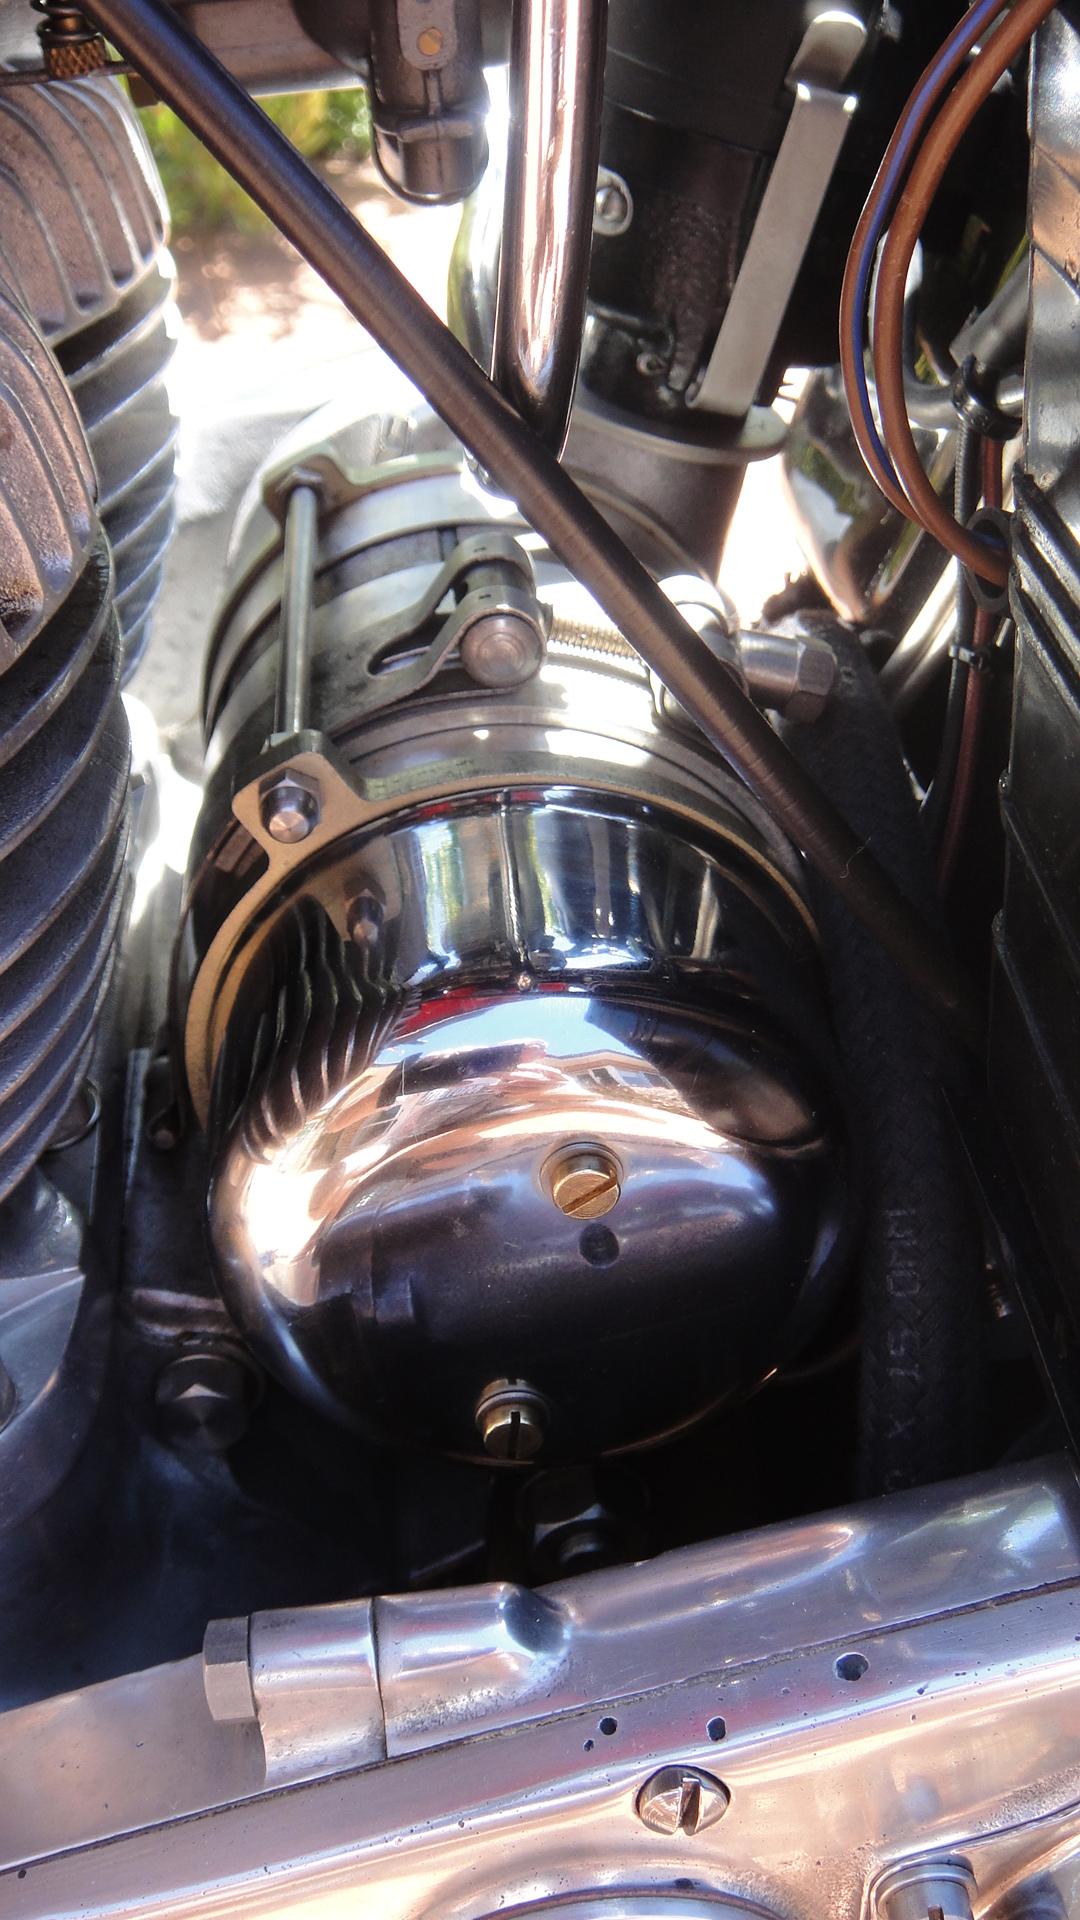 Ariel Square Four Alternators Iron Horse Spares Re Alternator Conversion 300watt On Mk1 Sq4 Drive Side